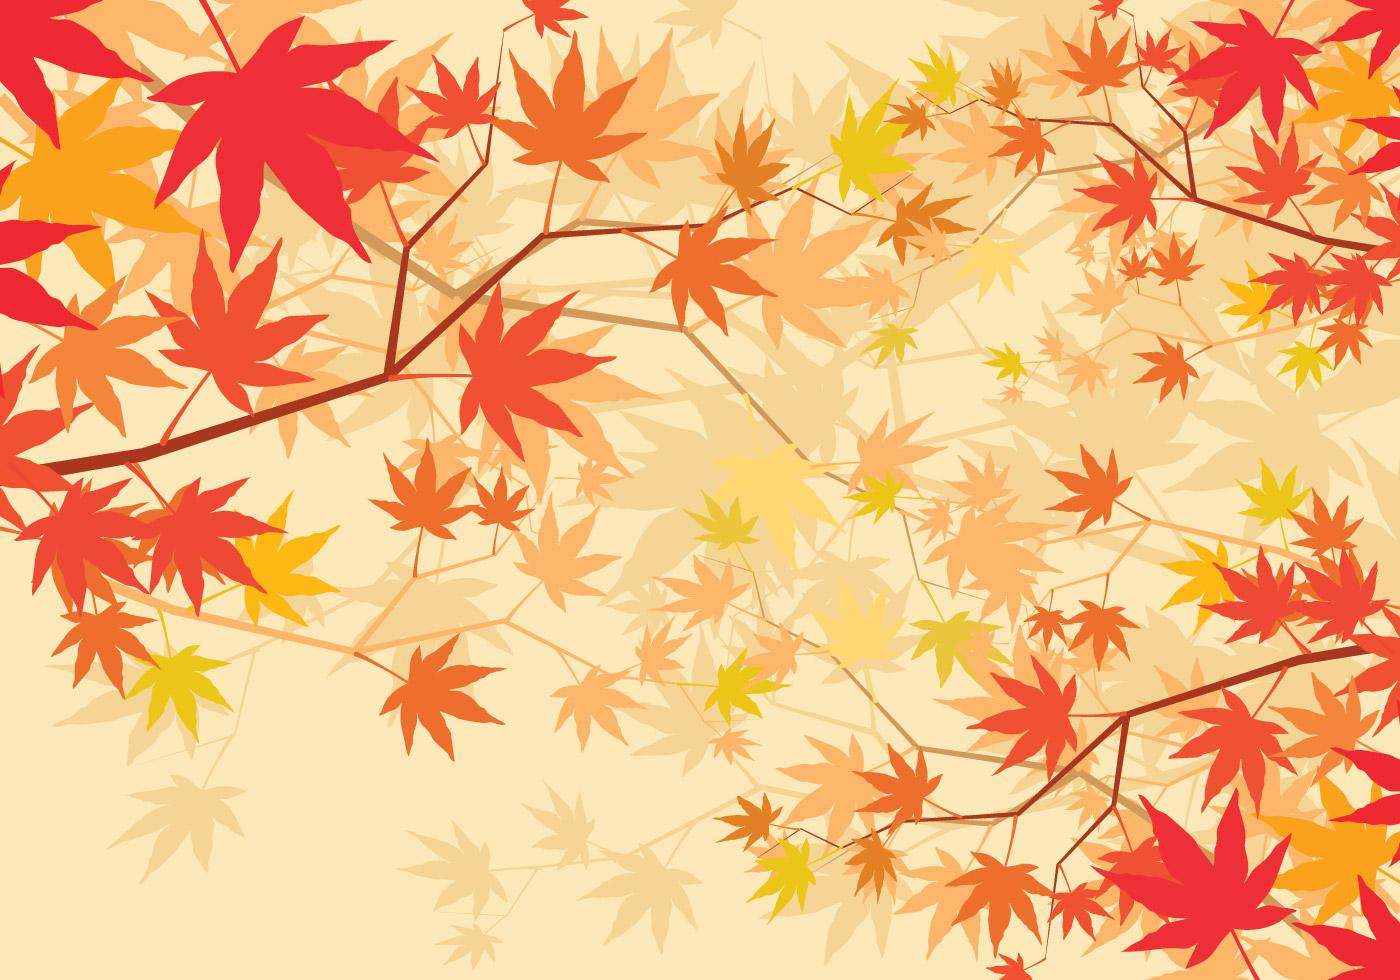 Cartoon Fall Wallpaper Japanese Maple Background Download Free Vector Art